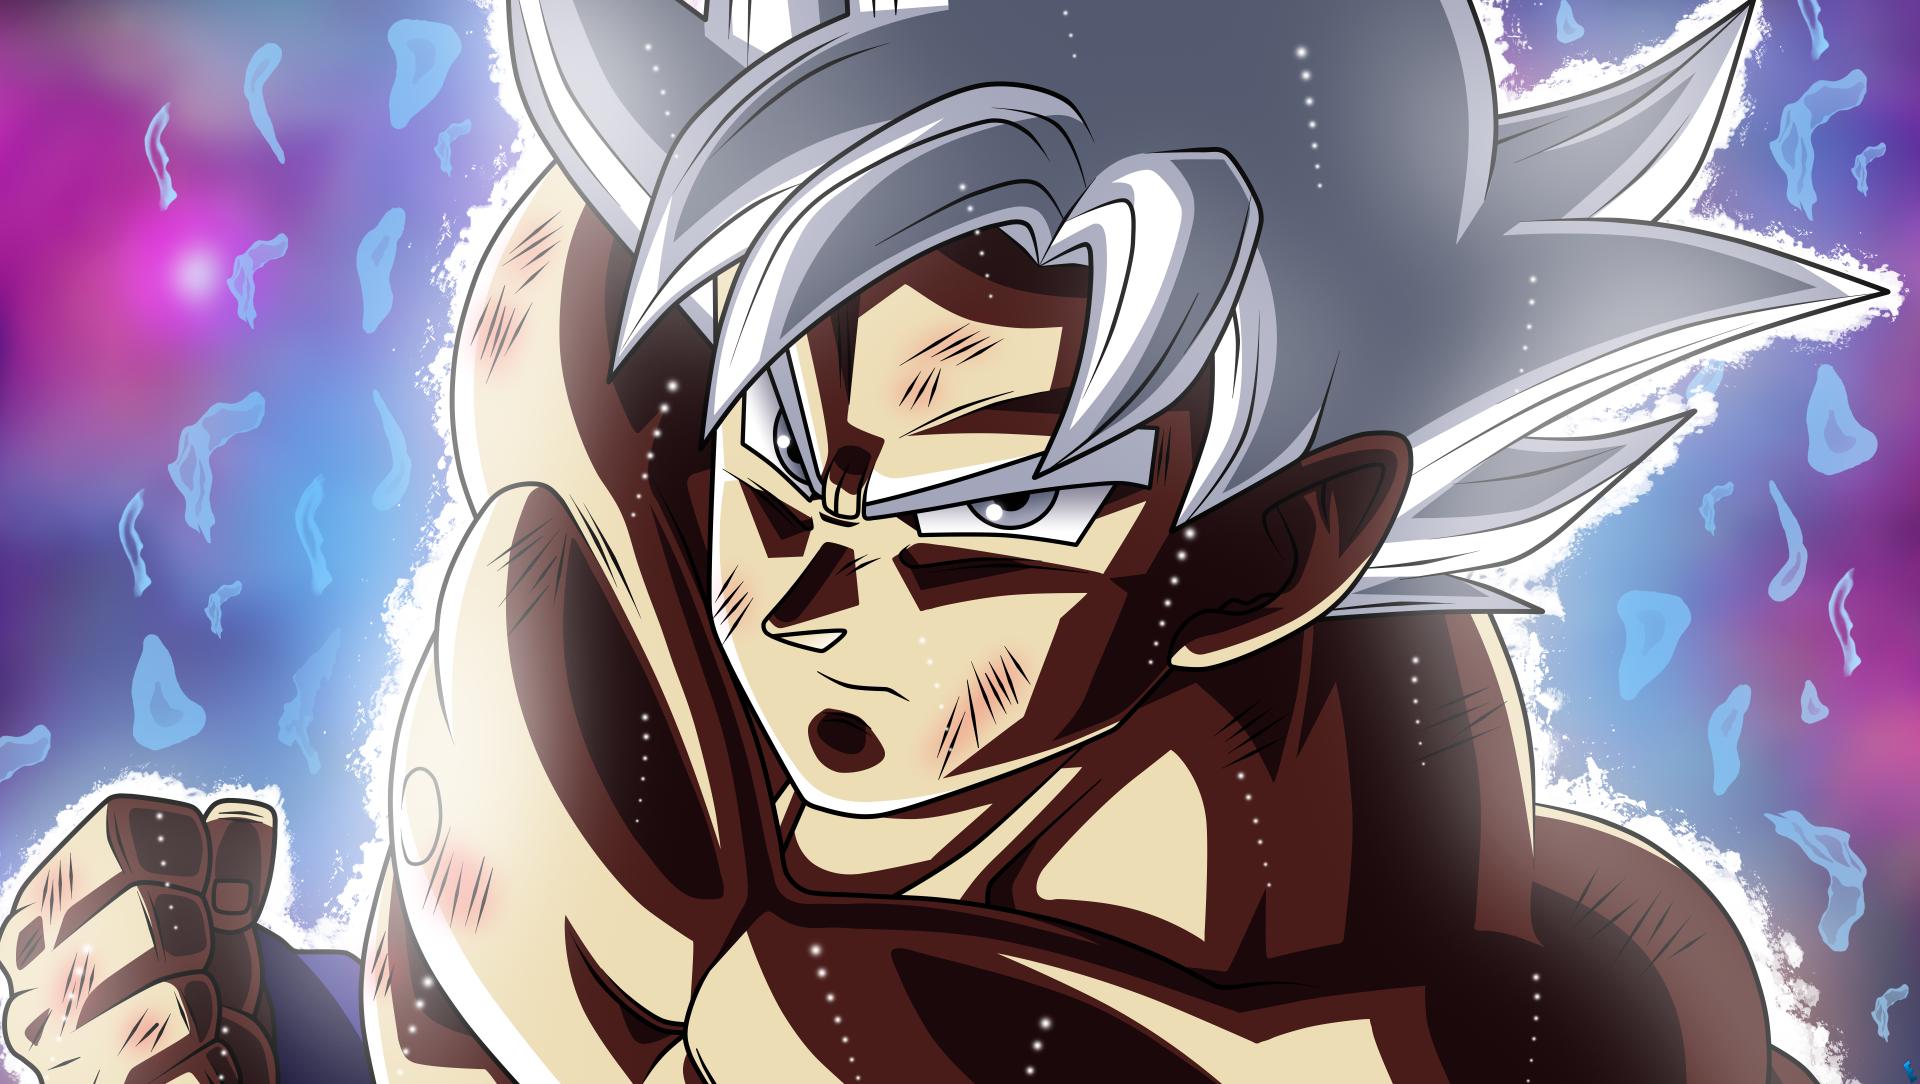 Anime - Dragon Ball Super  Goku Ultra Instinct (Dragon Ball) Wallpaper